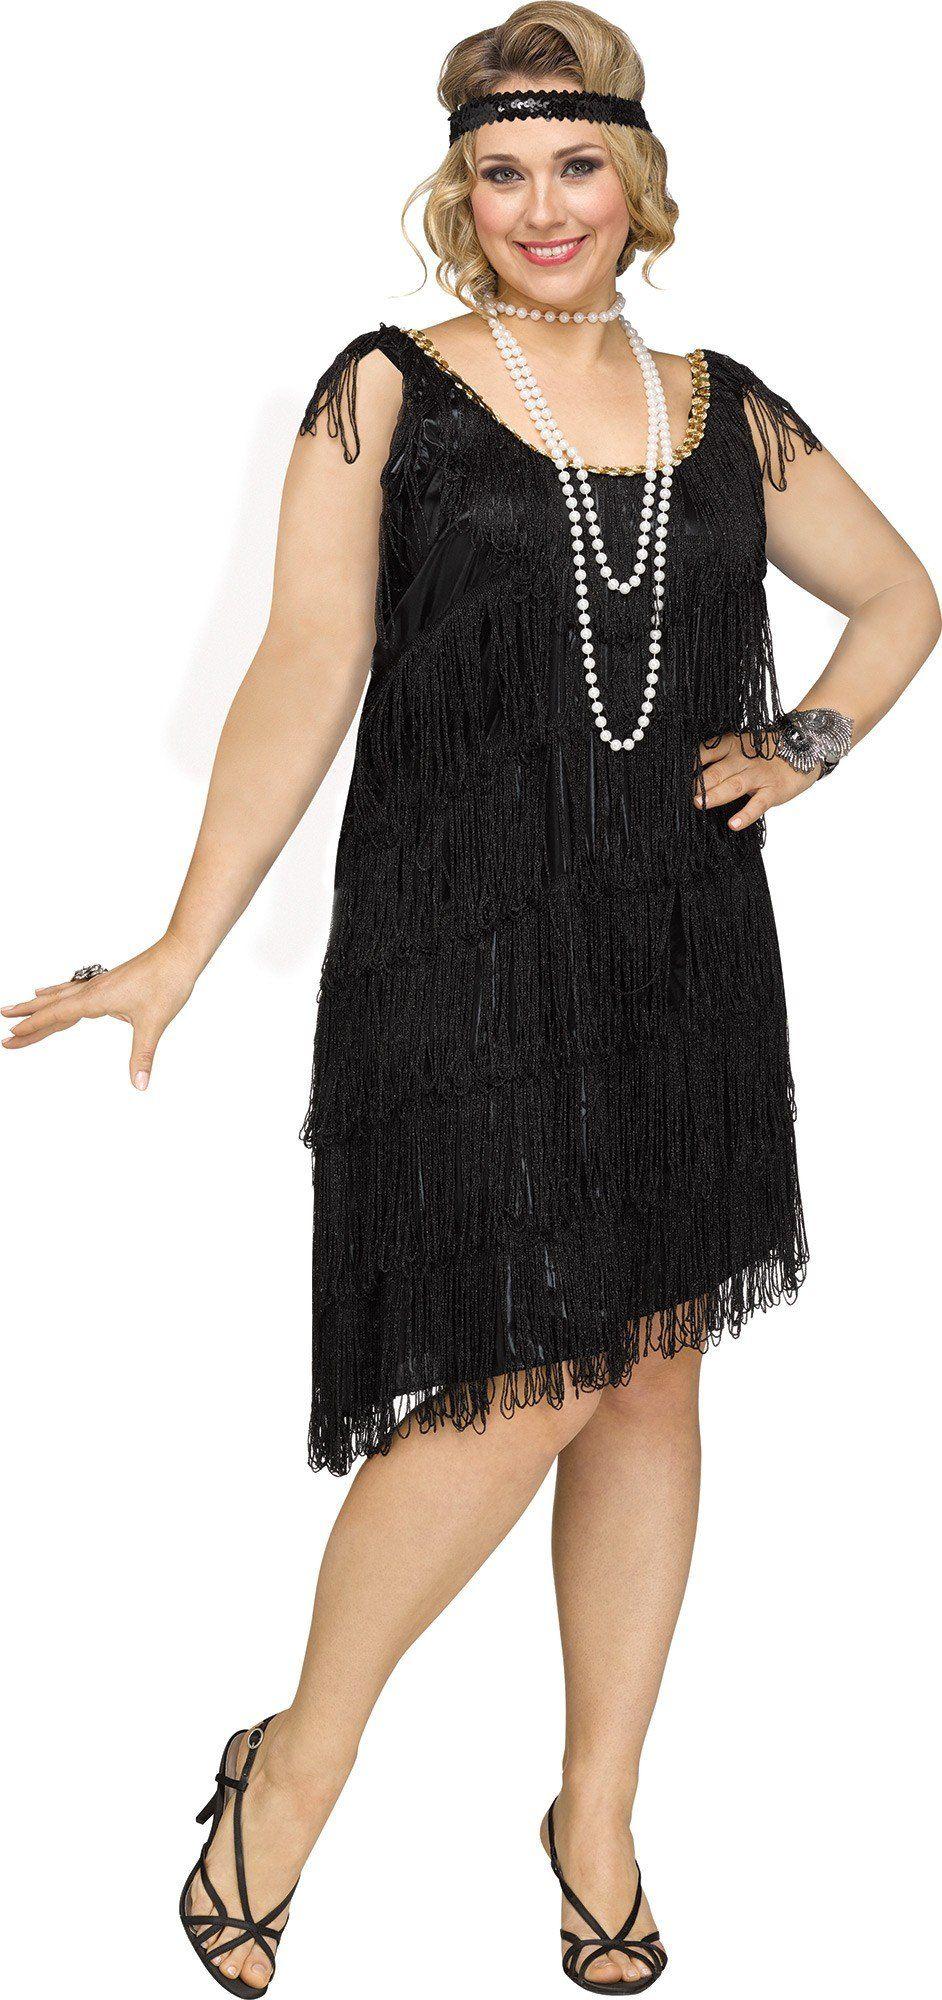 4261775ce55 Black Flapper Plus Size Costume in 2019